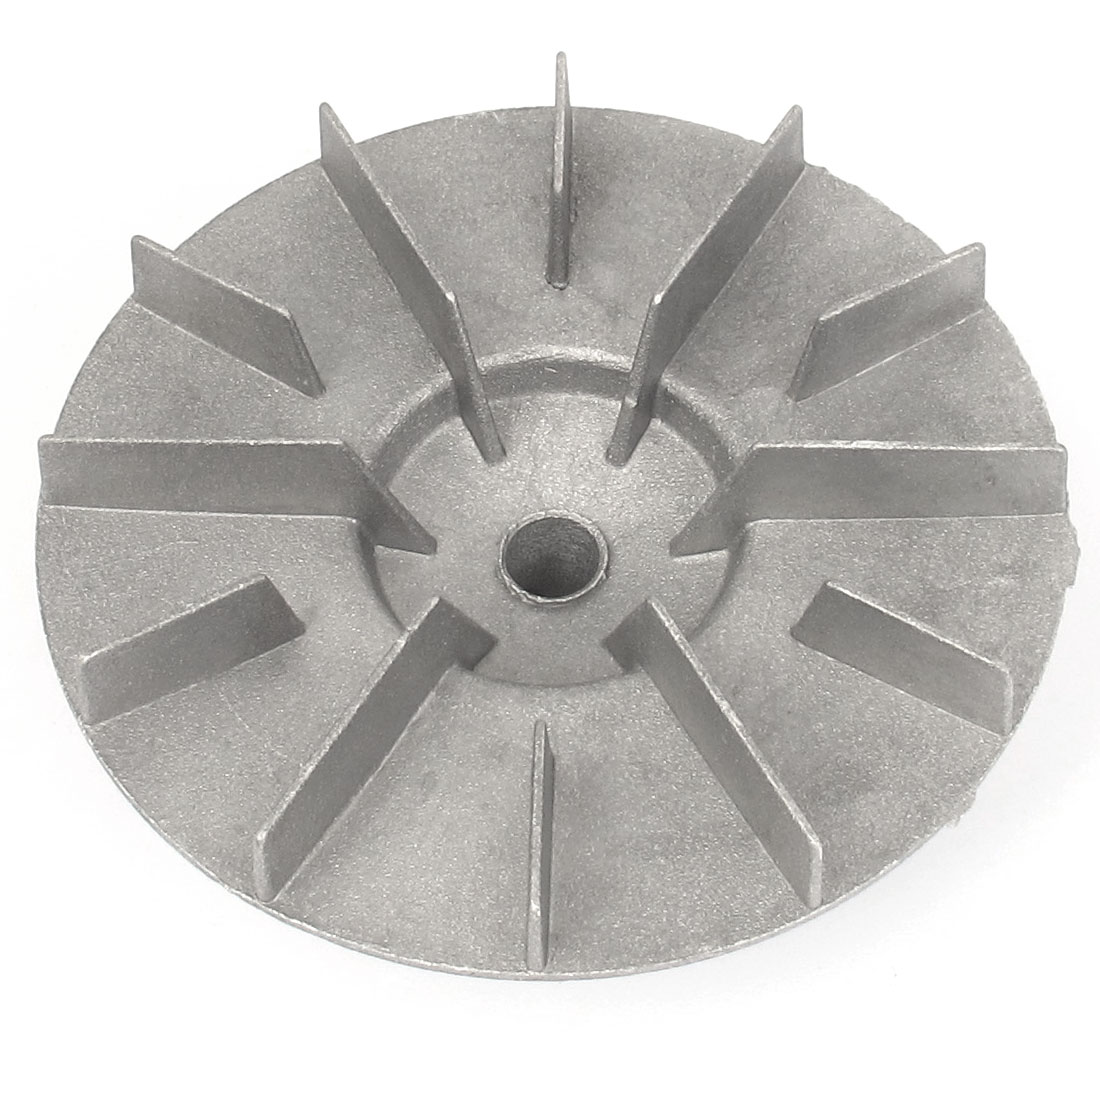 12mm Bore Dia Silver Tone Aluminum Centrifugal Blower Fan Impeller Vane Wheel